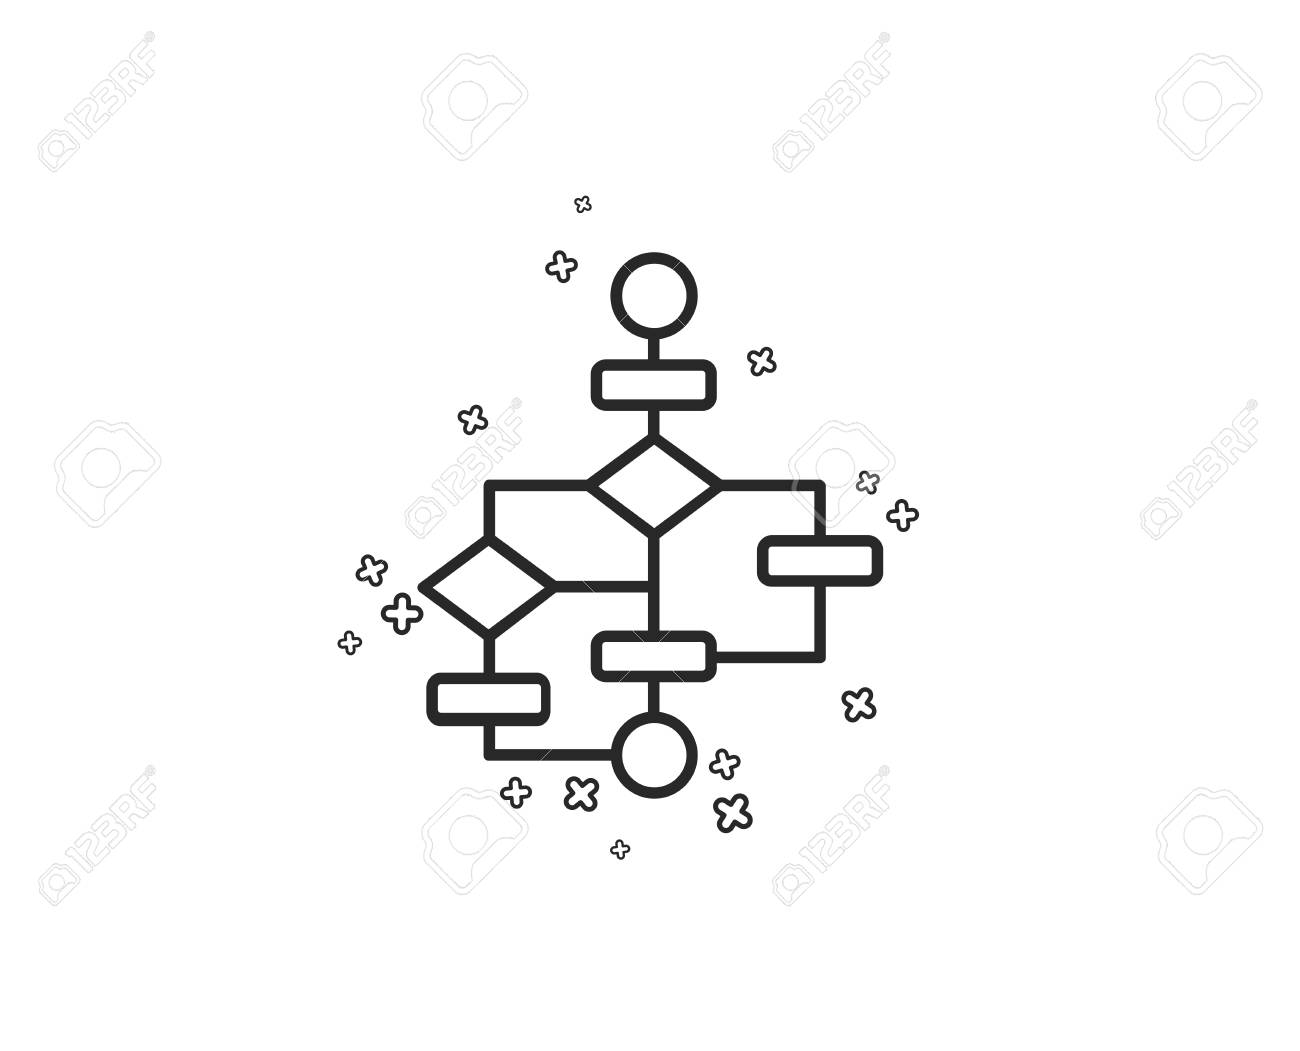 block diagram line icon  path scheme sign  algorithm symbol  geometric  shapes  random